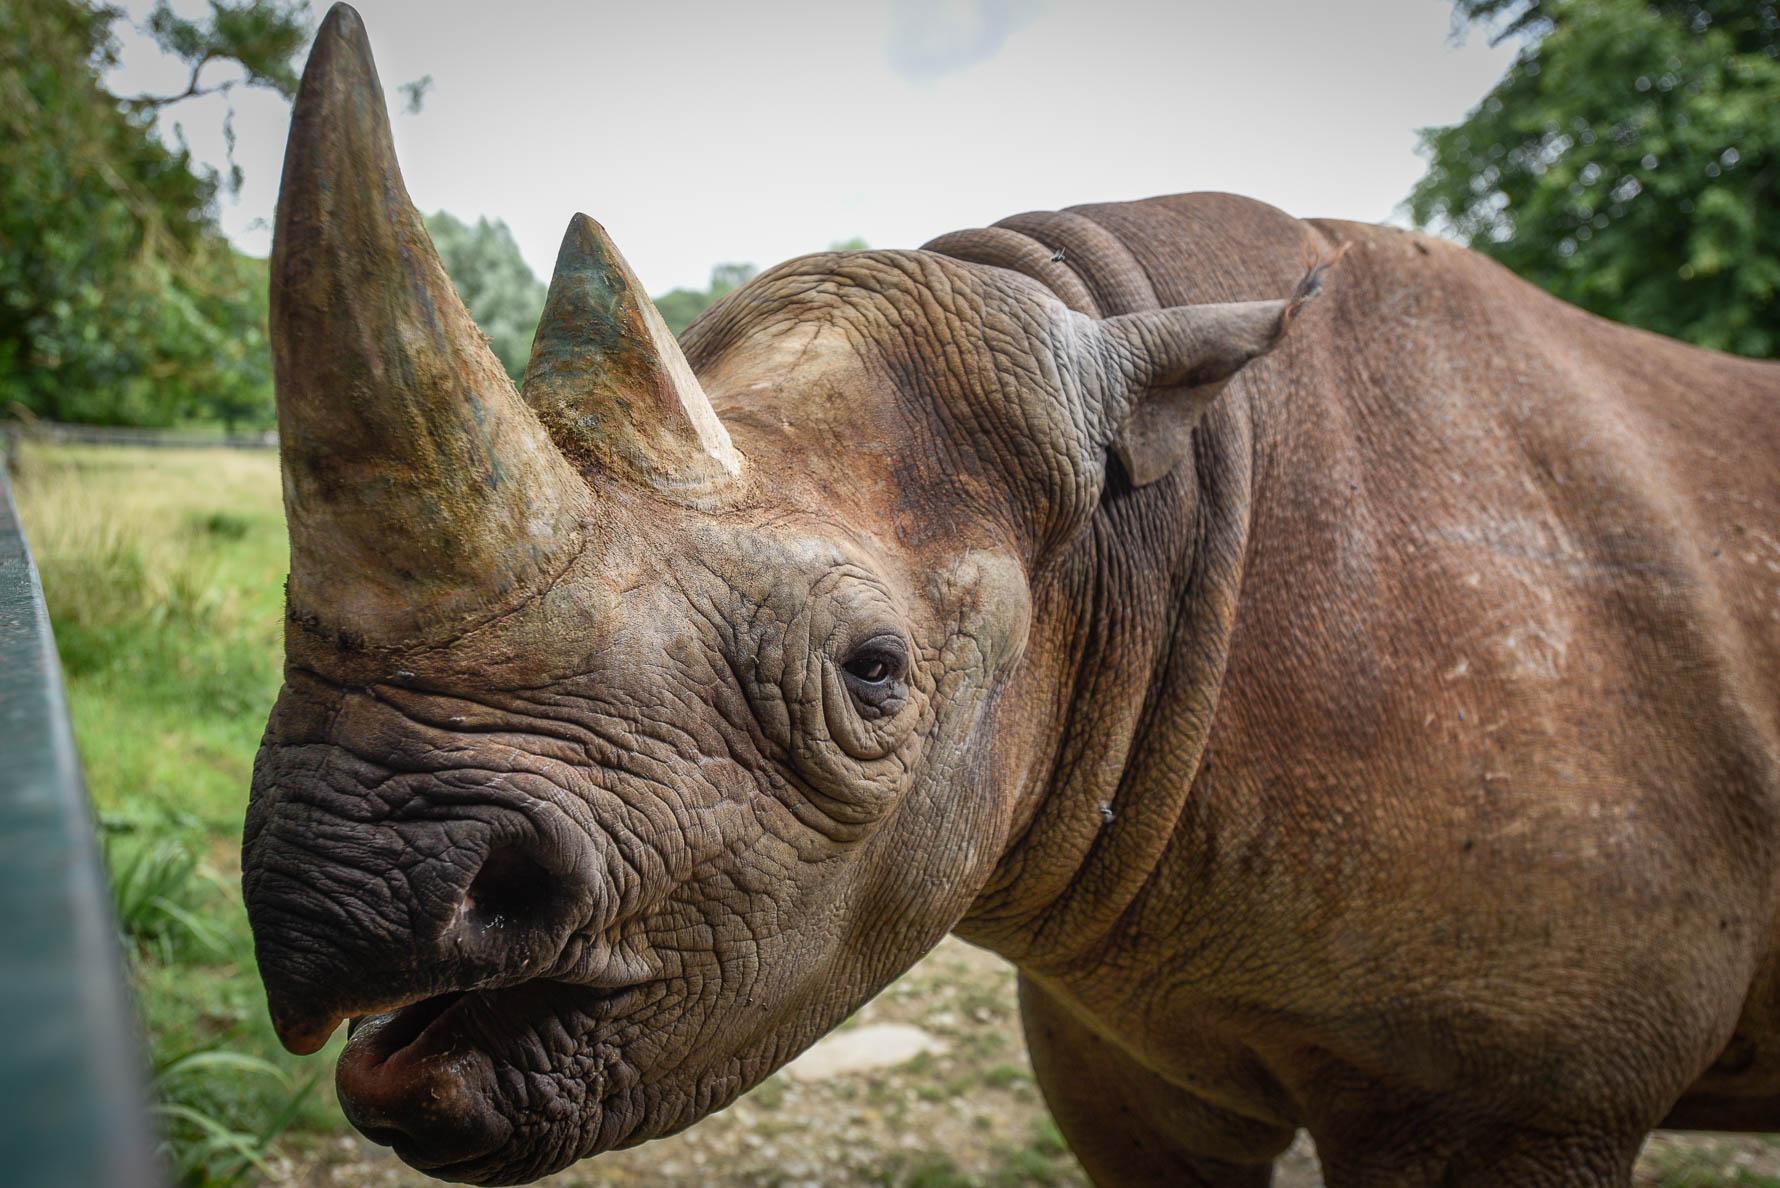 Rosie the Black Rhino